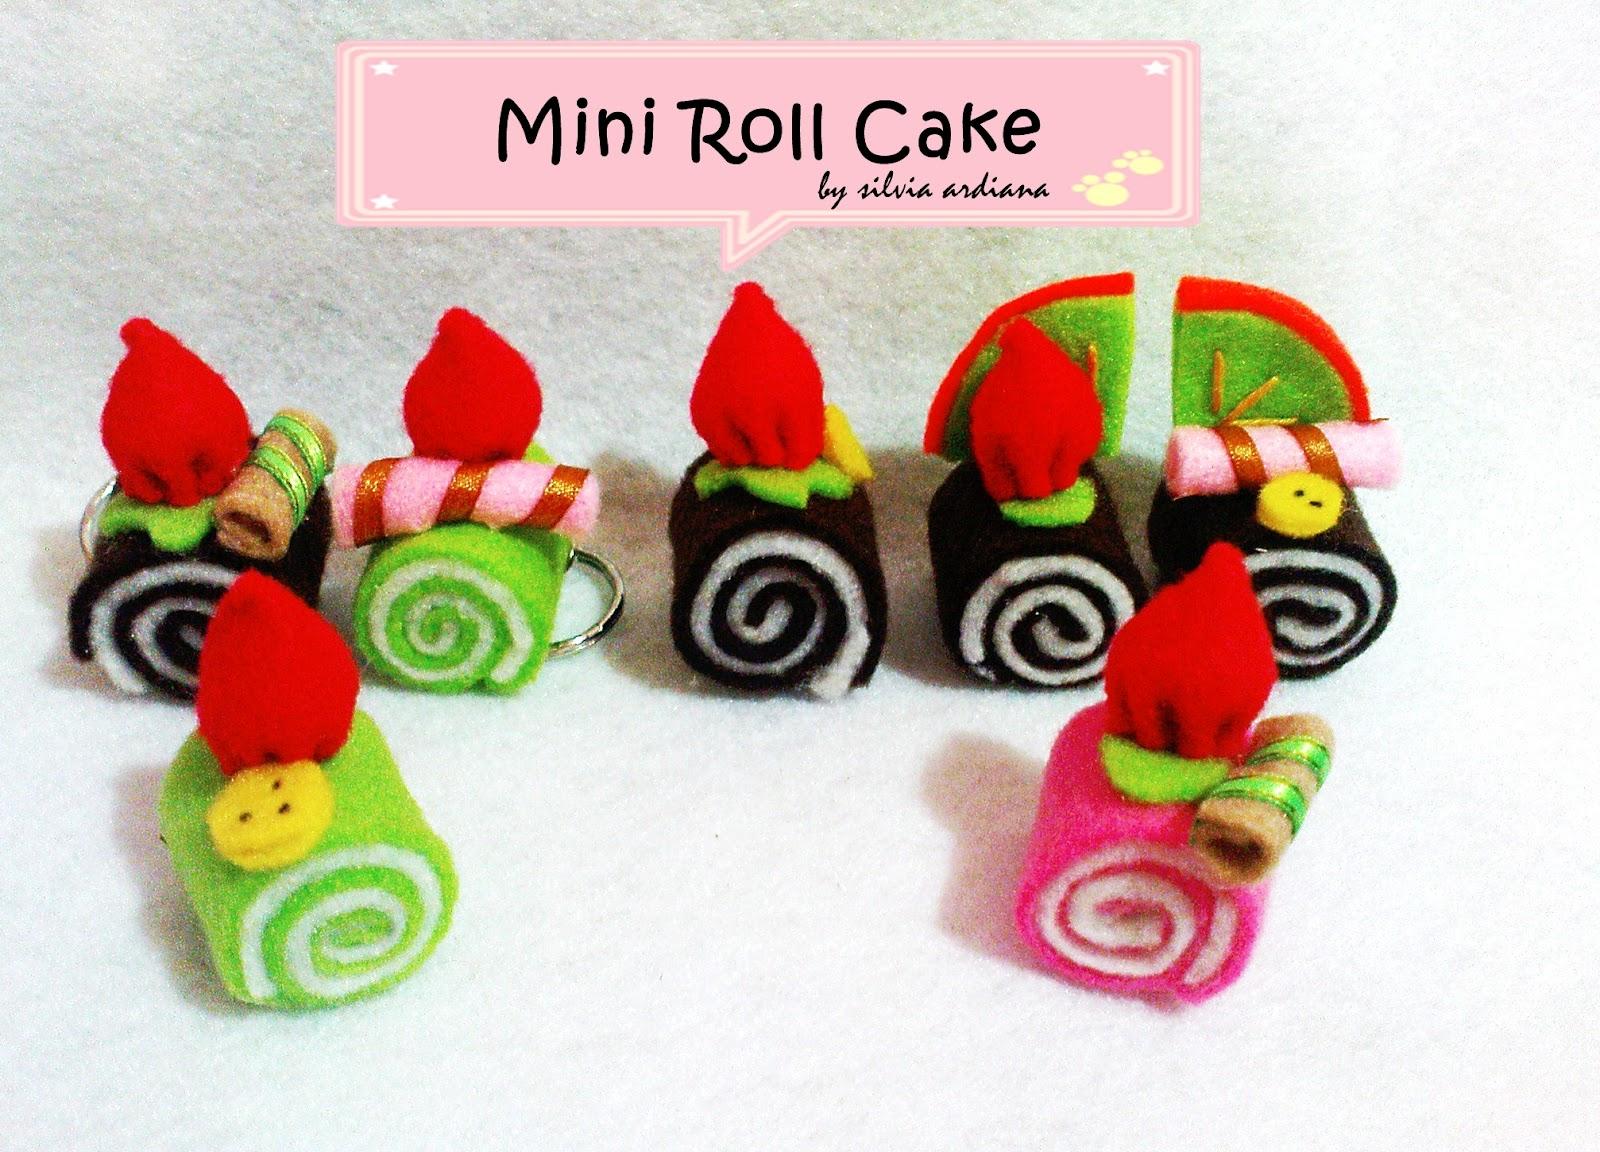 Membuat Mini Roll Cake Lucu Smp Negeri 1 Masbagik